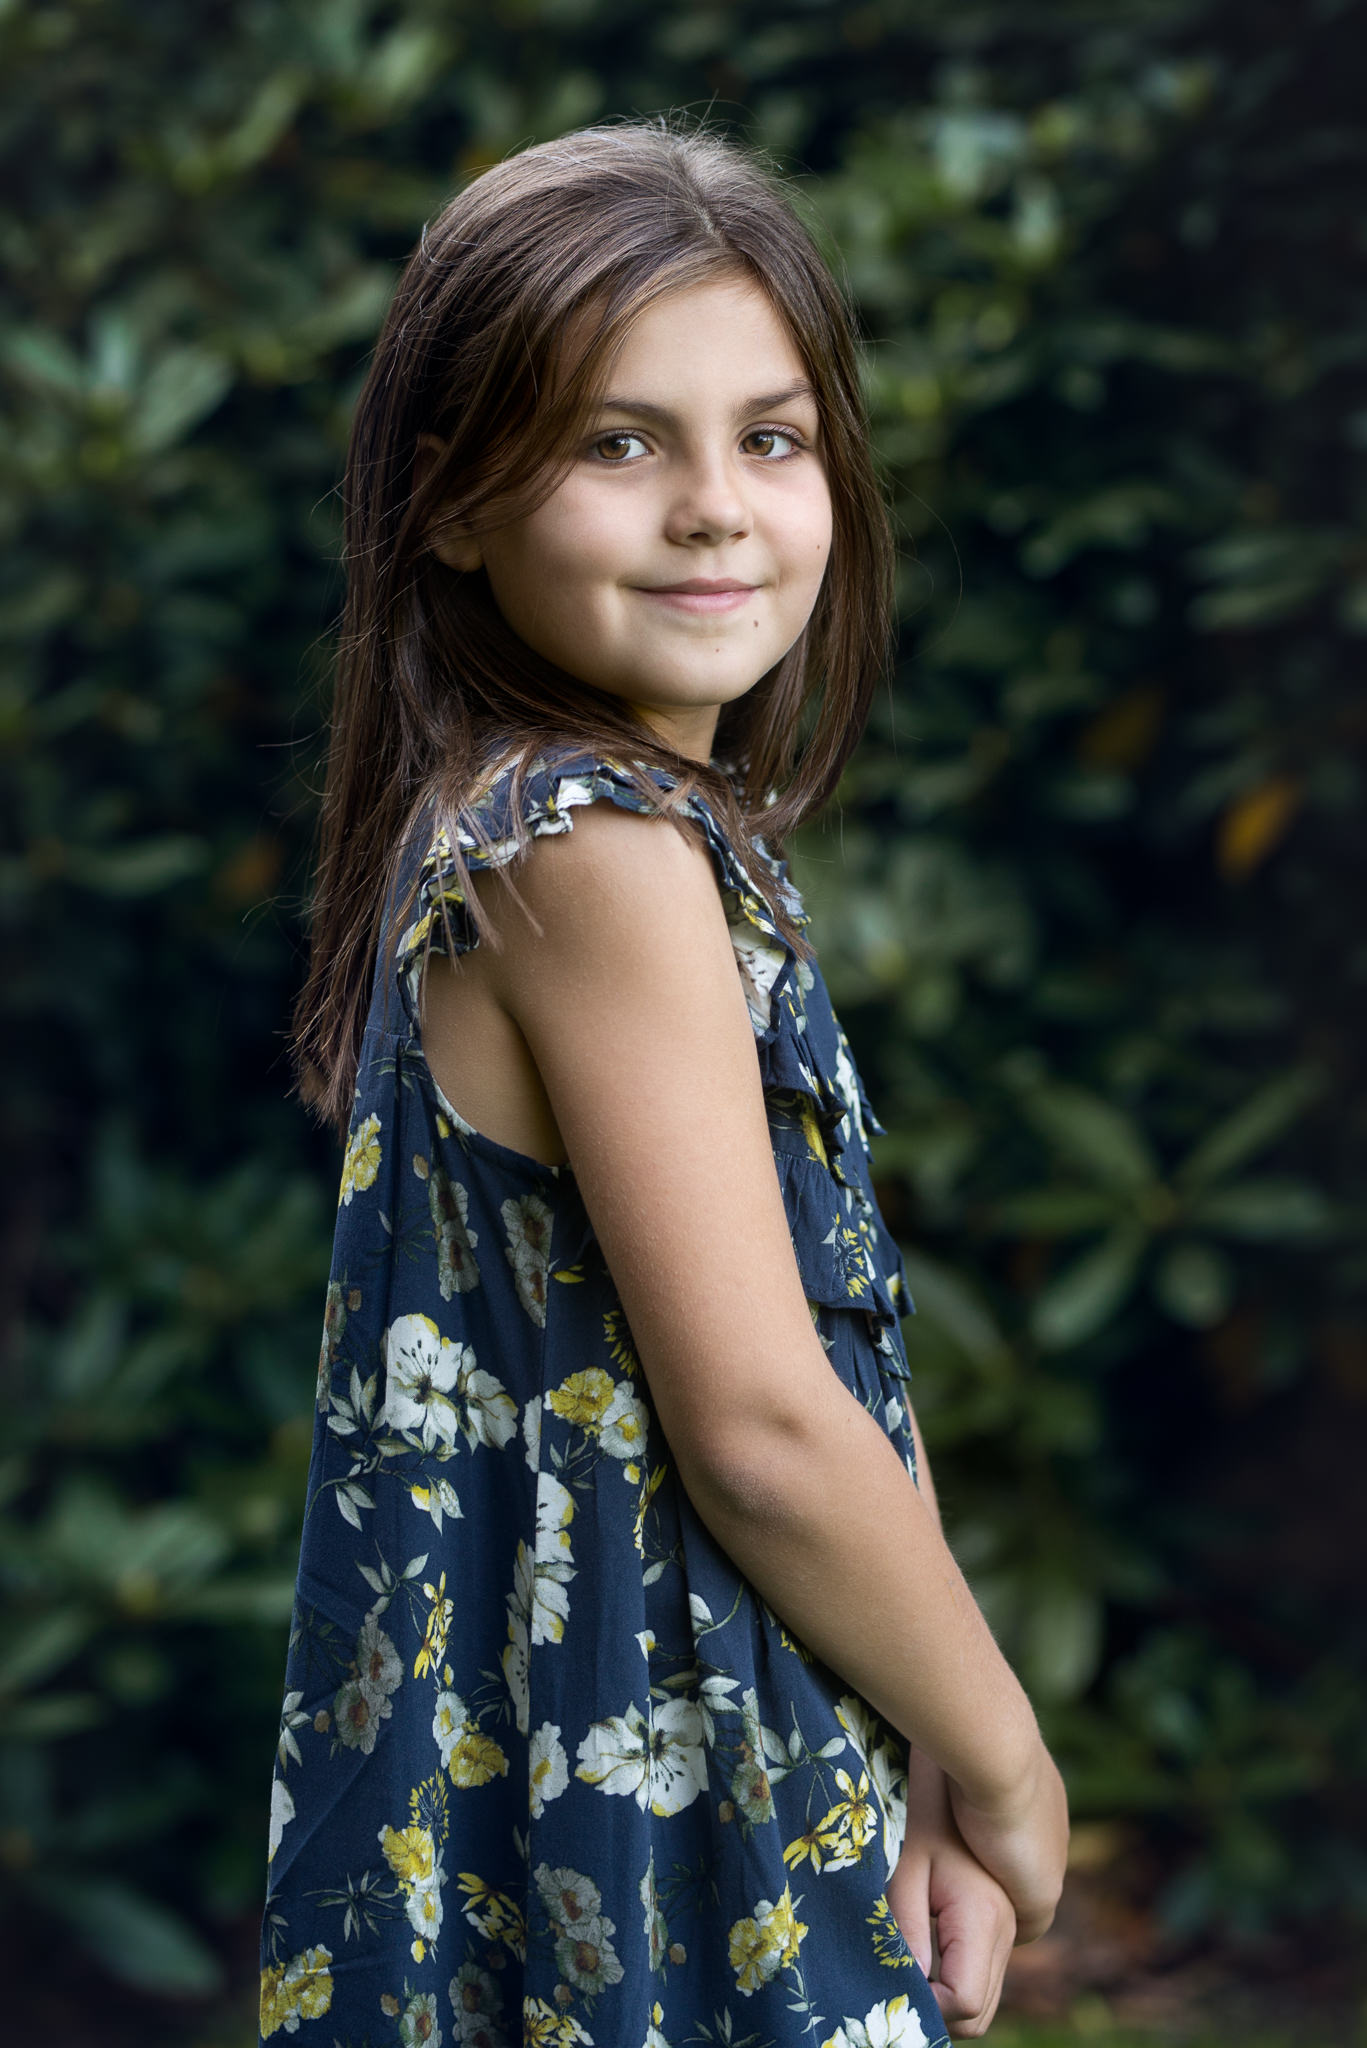 Girl stood against greenery | Children's Photography